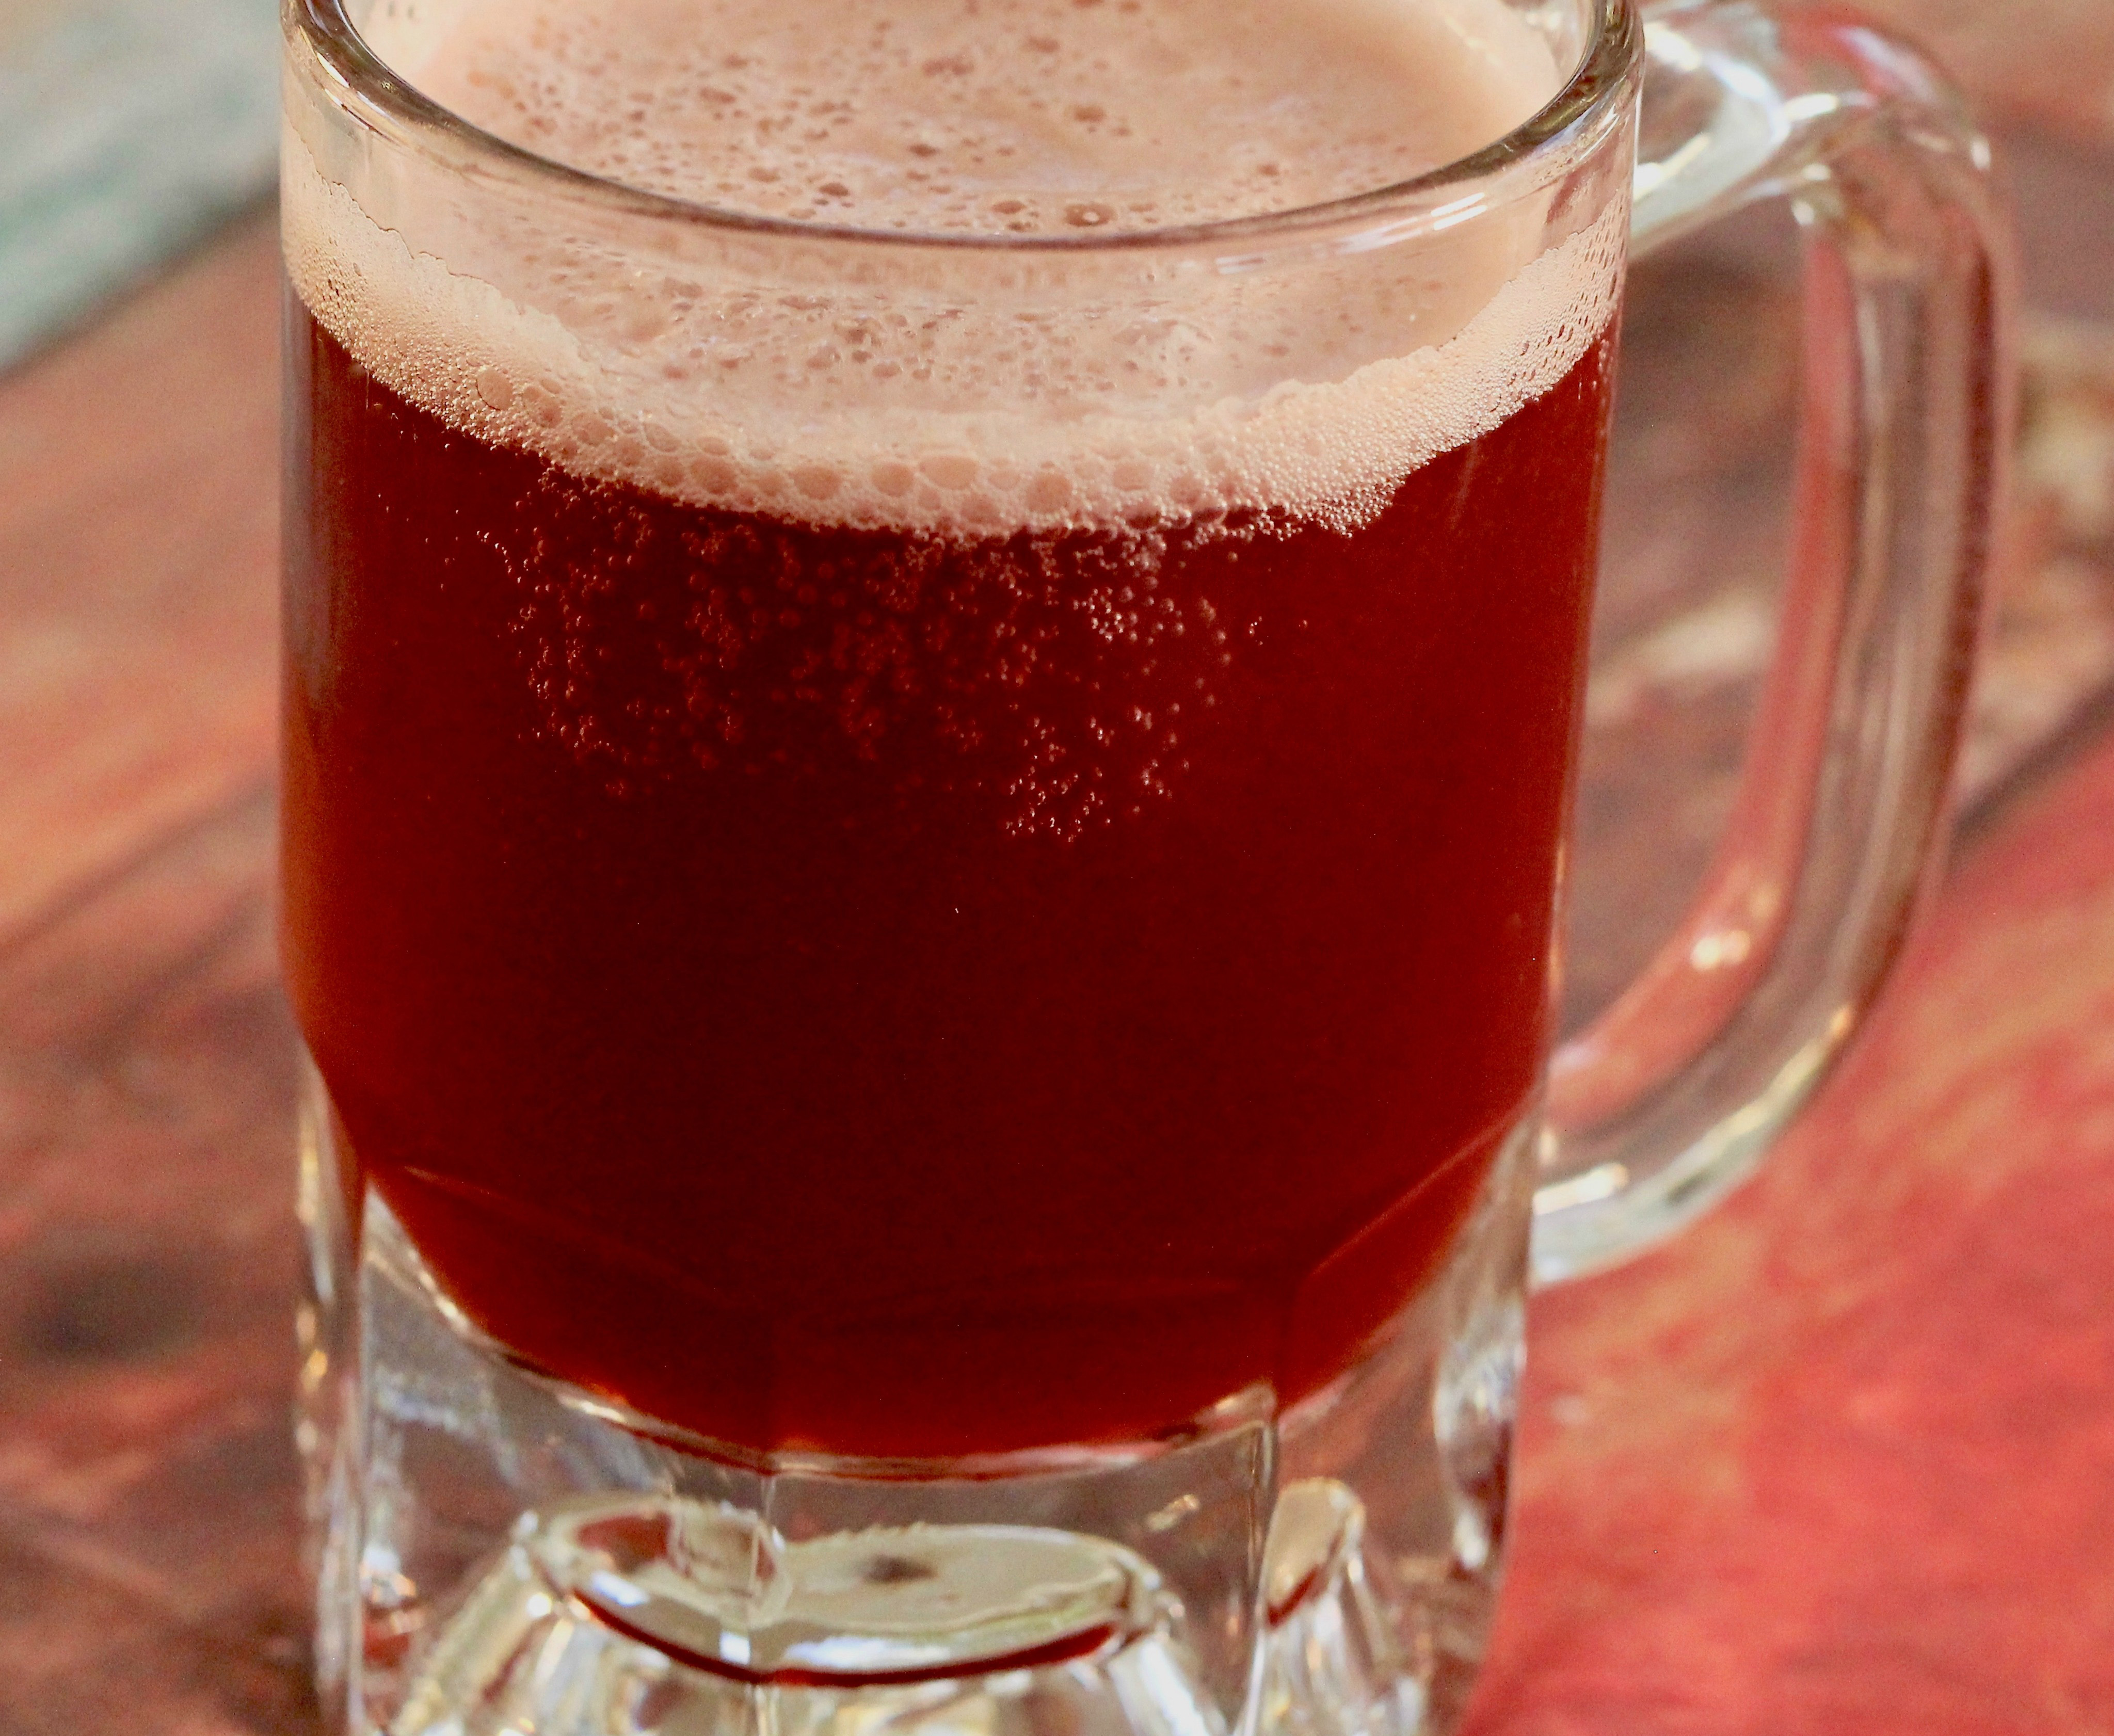 John's Tasty German Cherry Beer